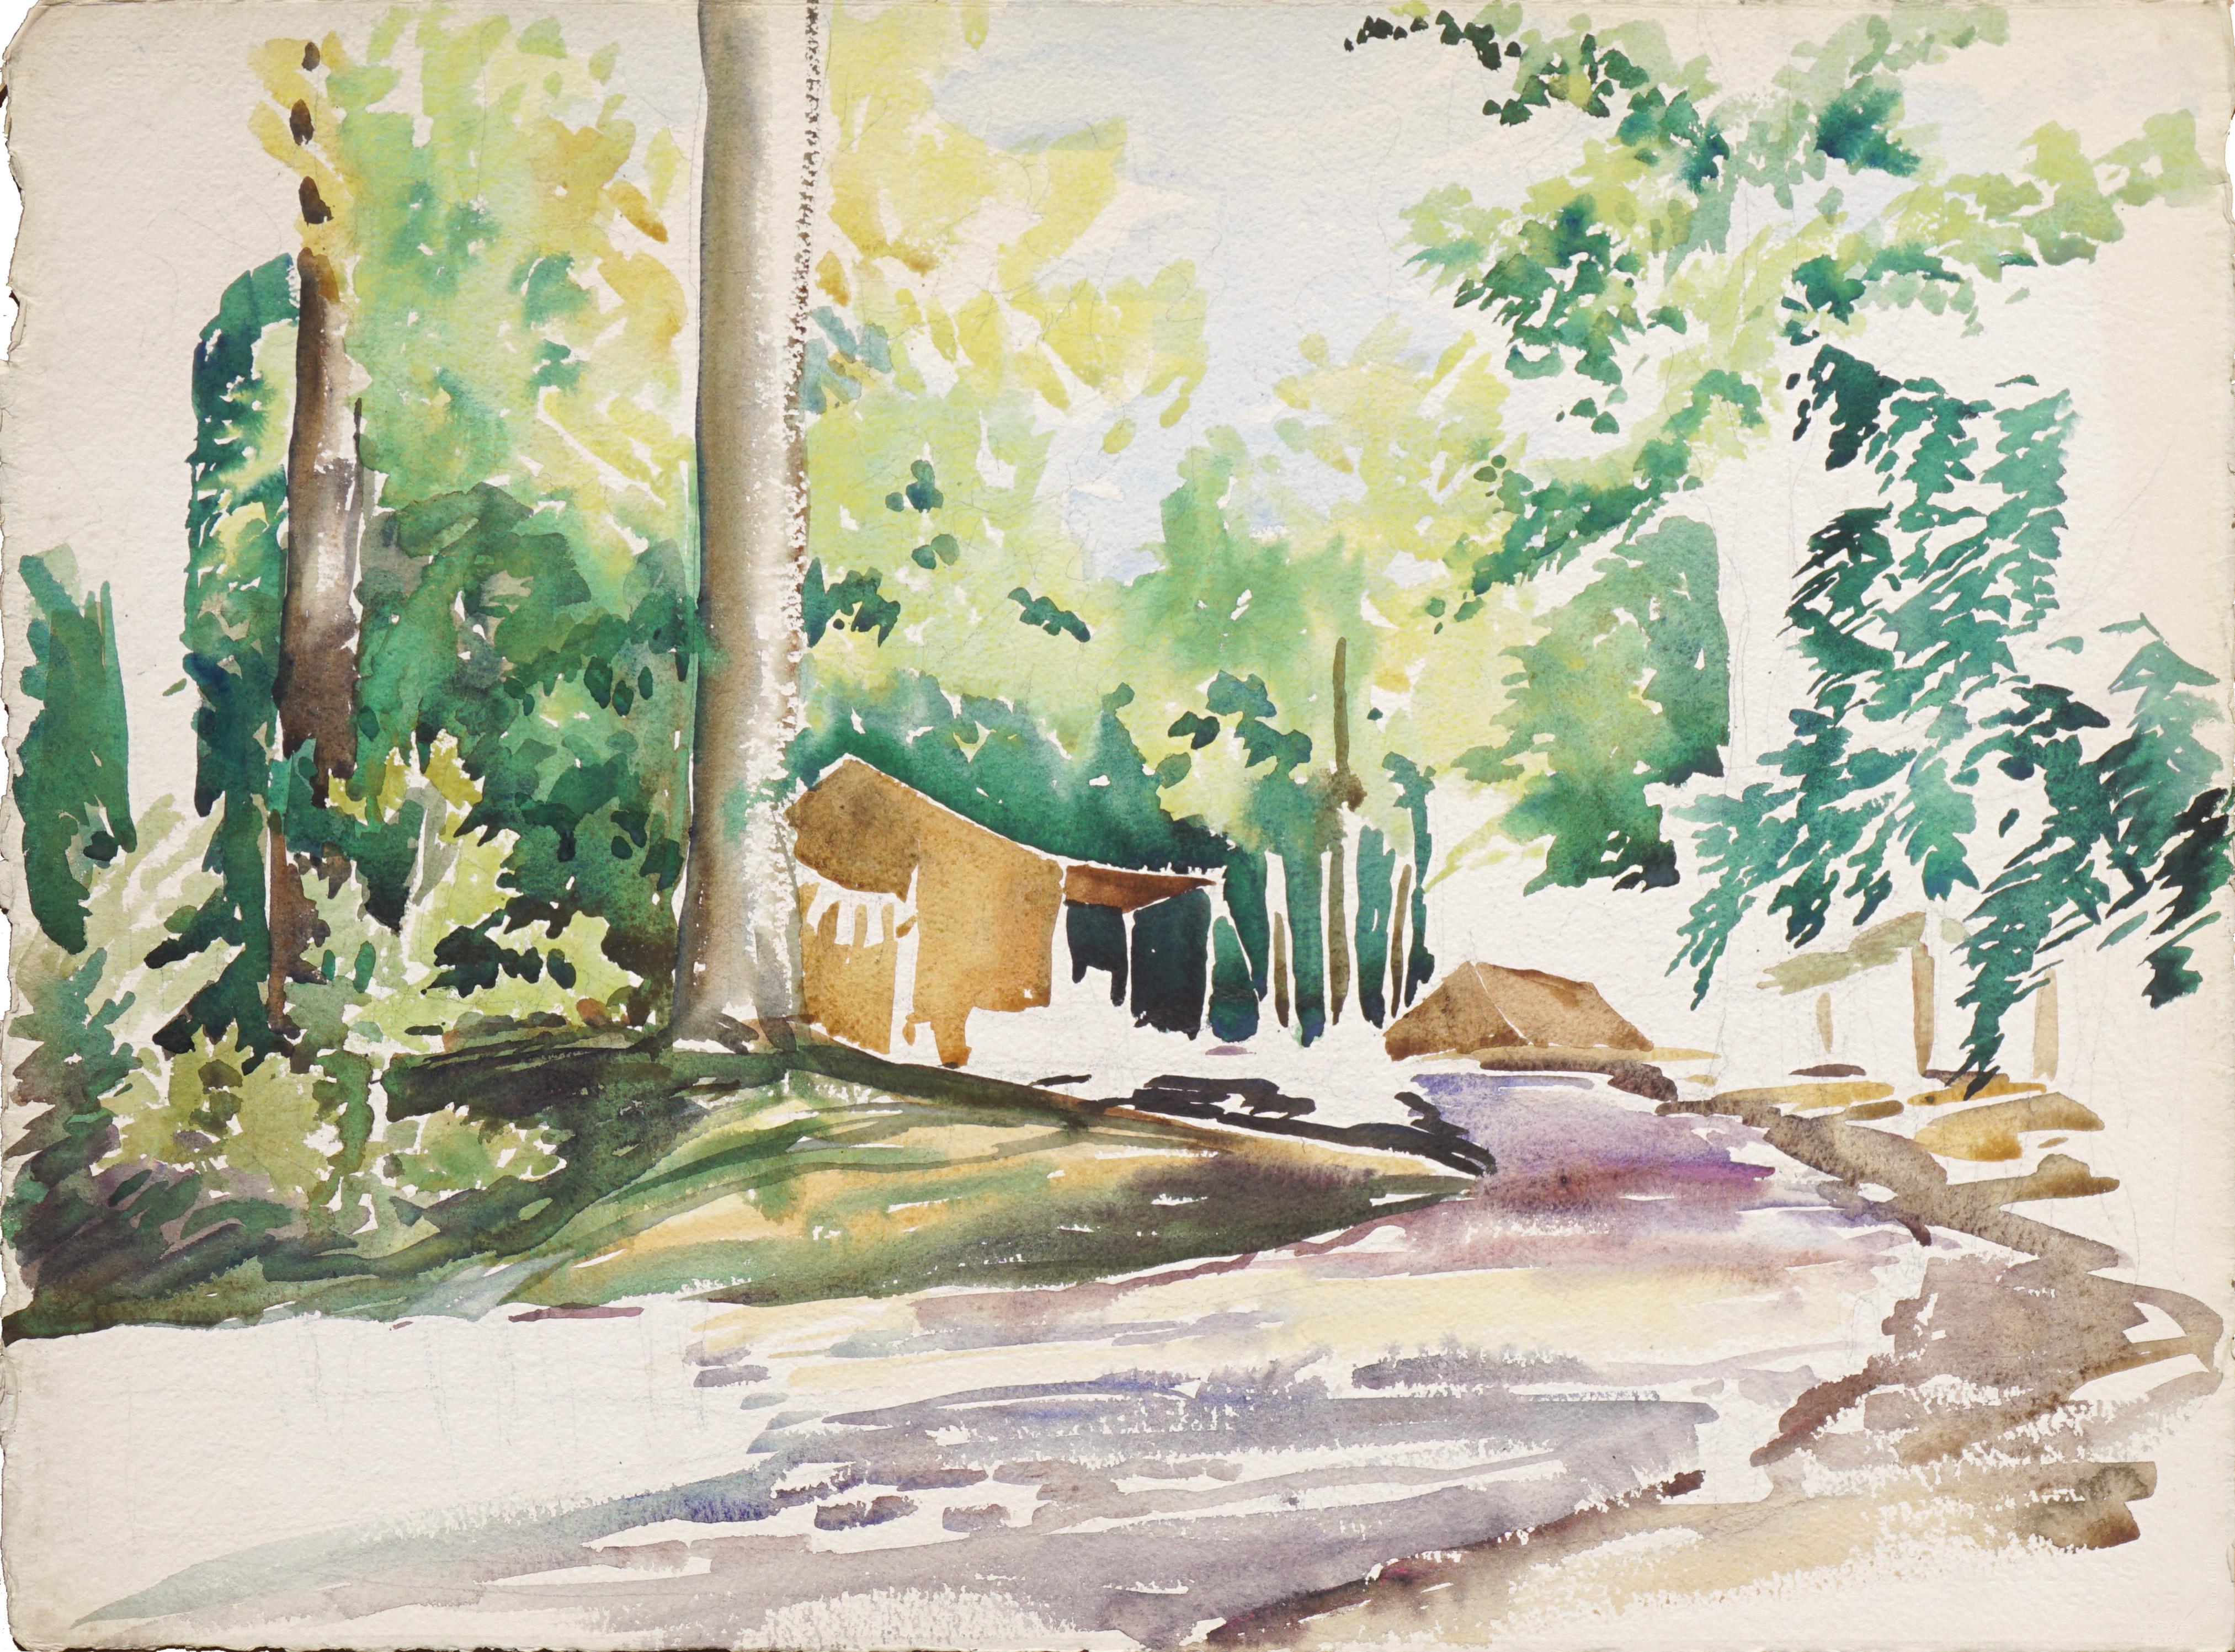 Creekside Campsite - Mid Century Forest Landscape